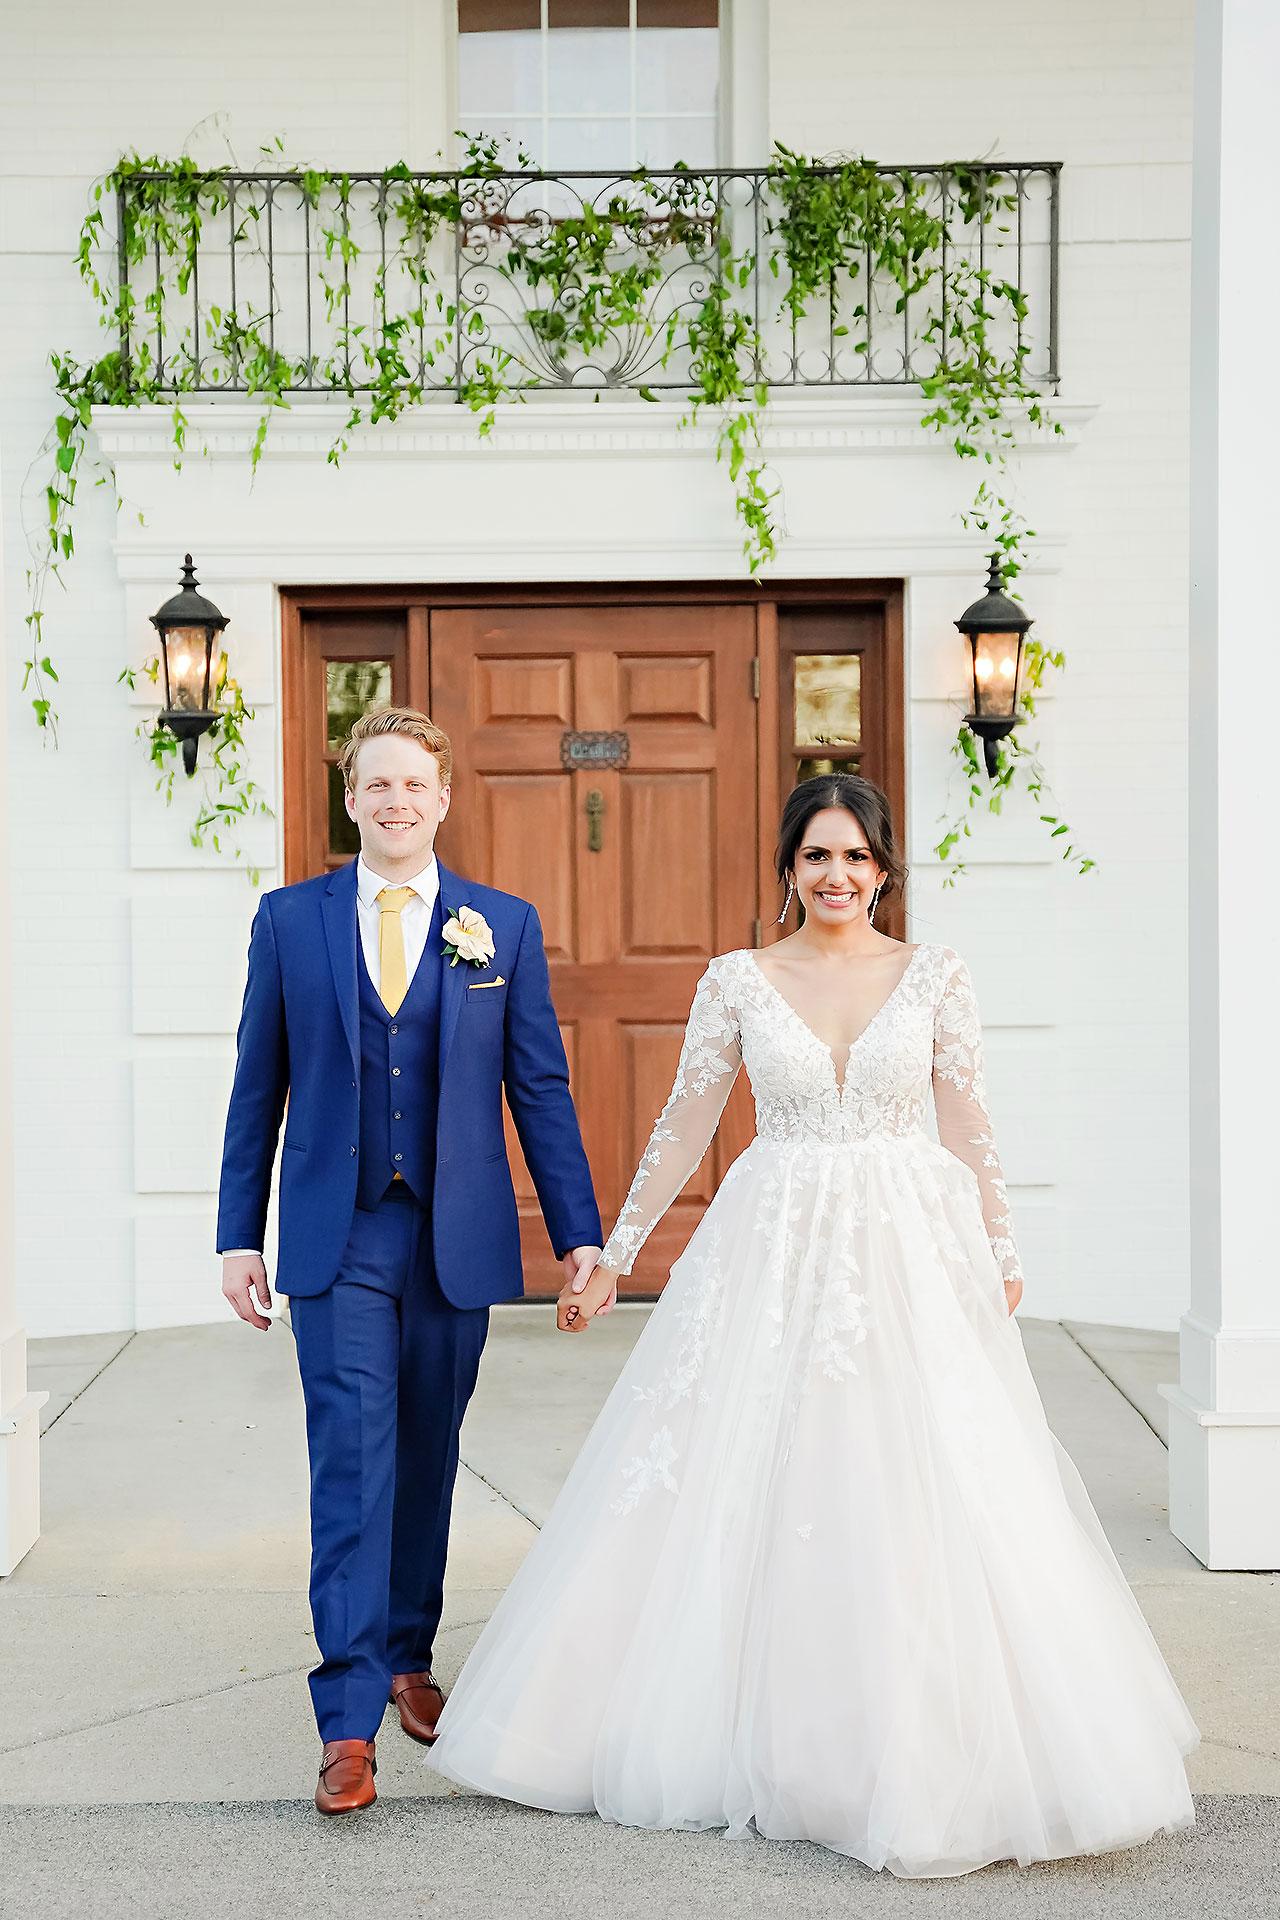 Nadia Parker Black Iris Estate Carmel Indiana Wedding May 2021 276